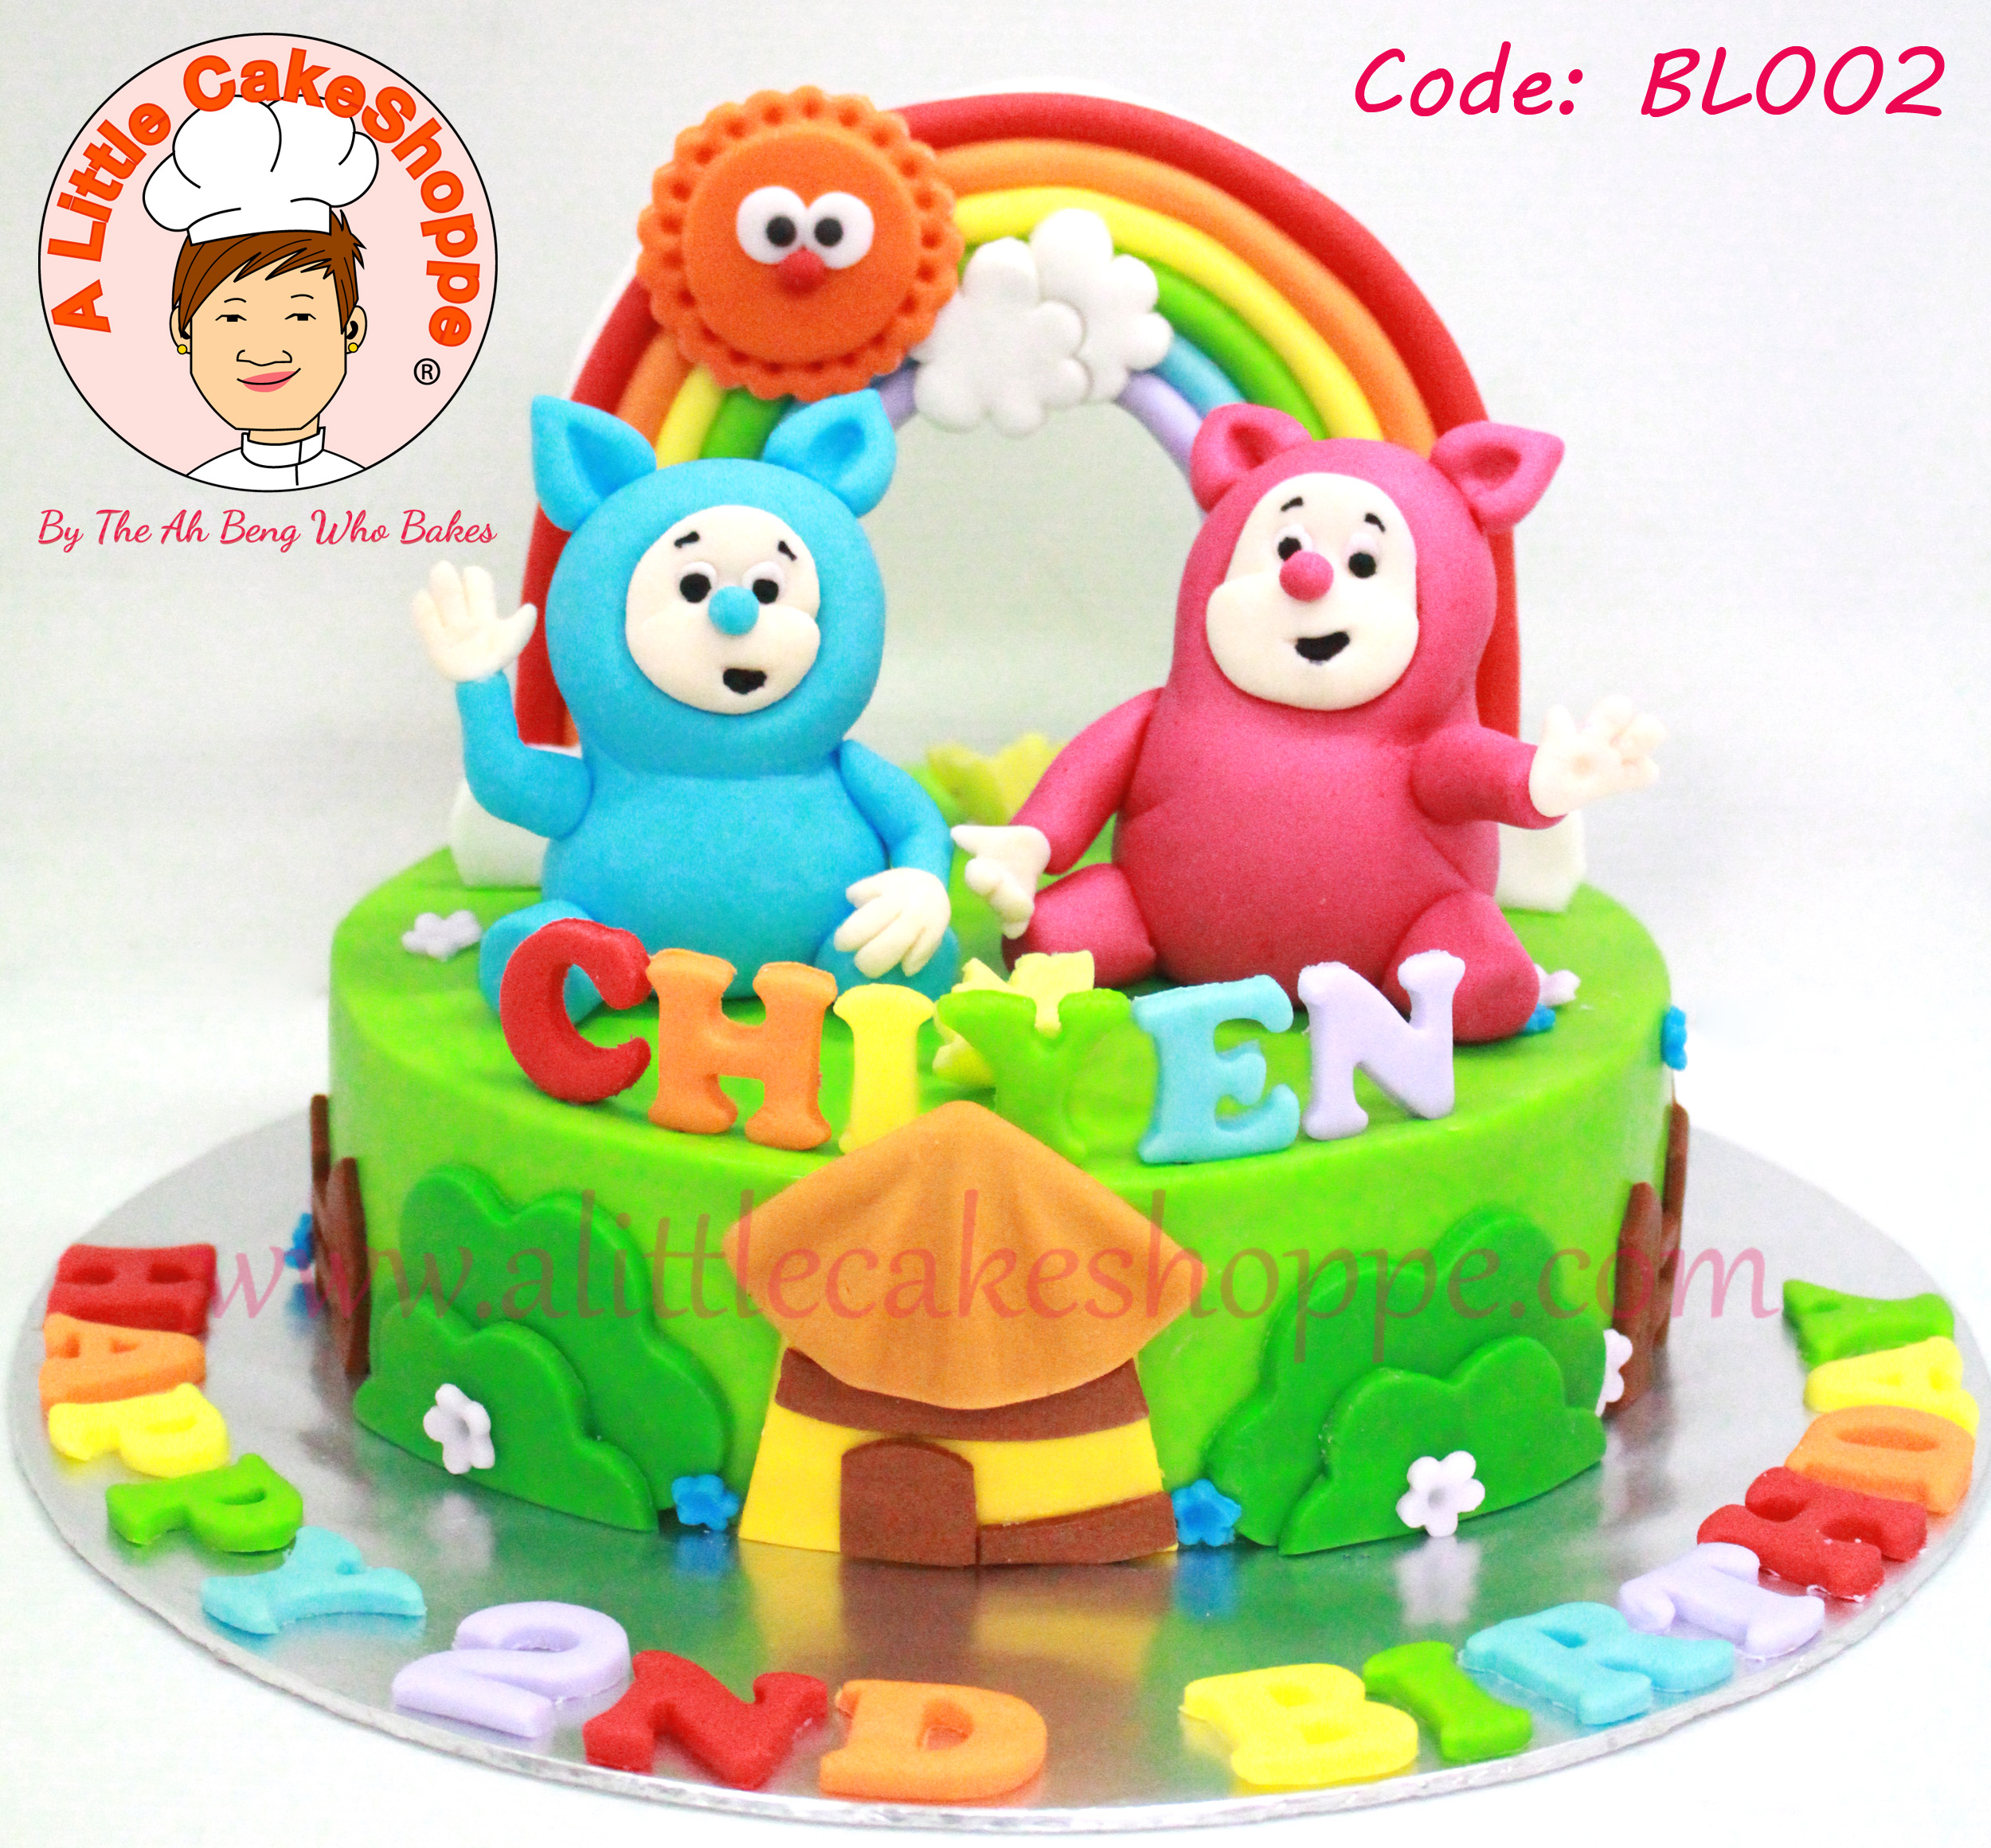 Code: BL002